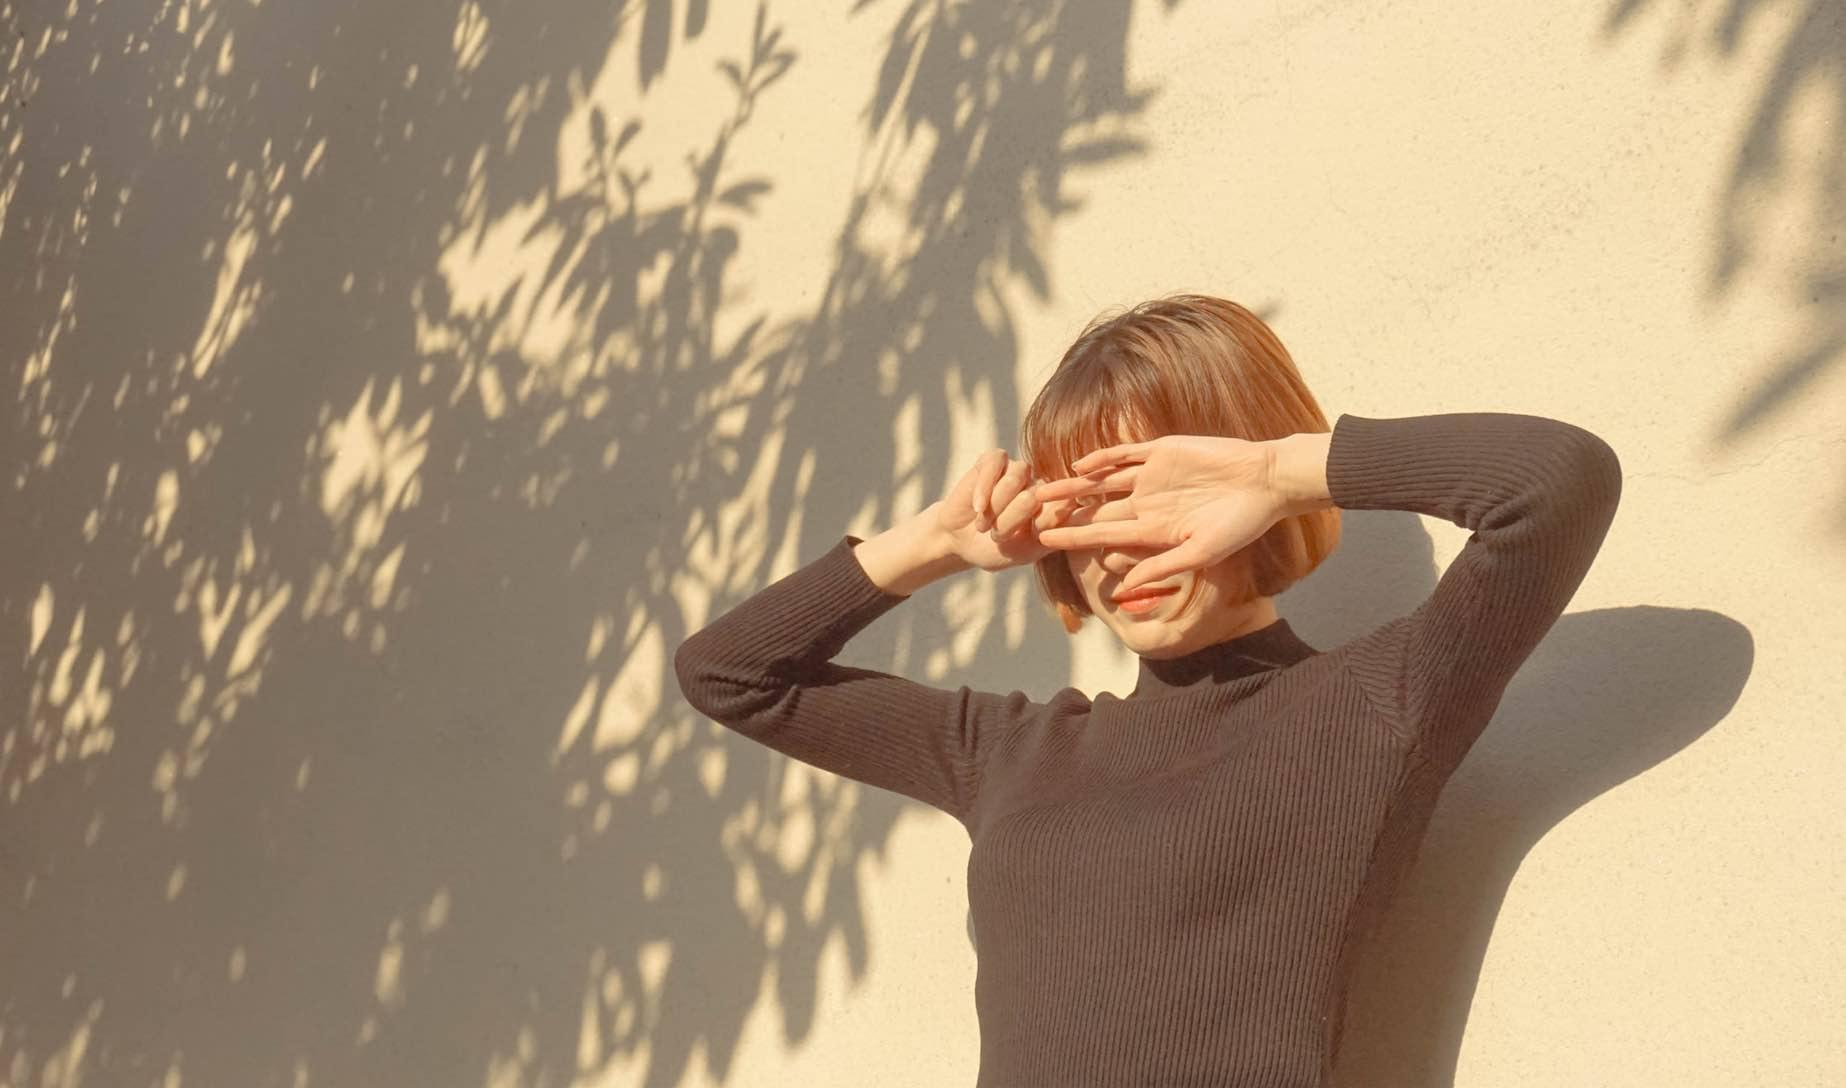 Rekomendasi Sunscreen Untuk Kulit Berjerawat